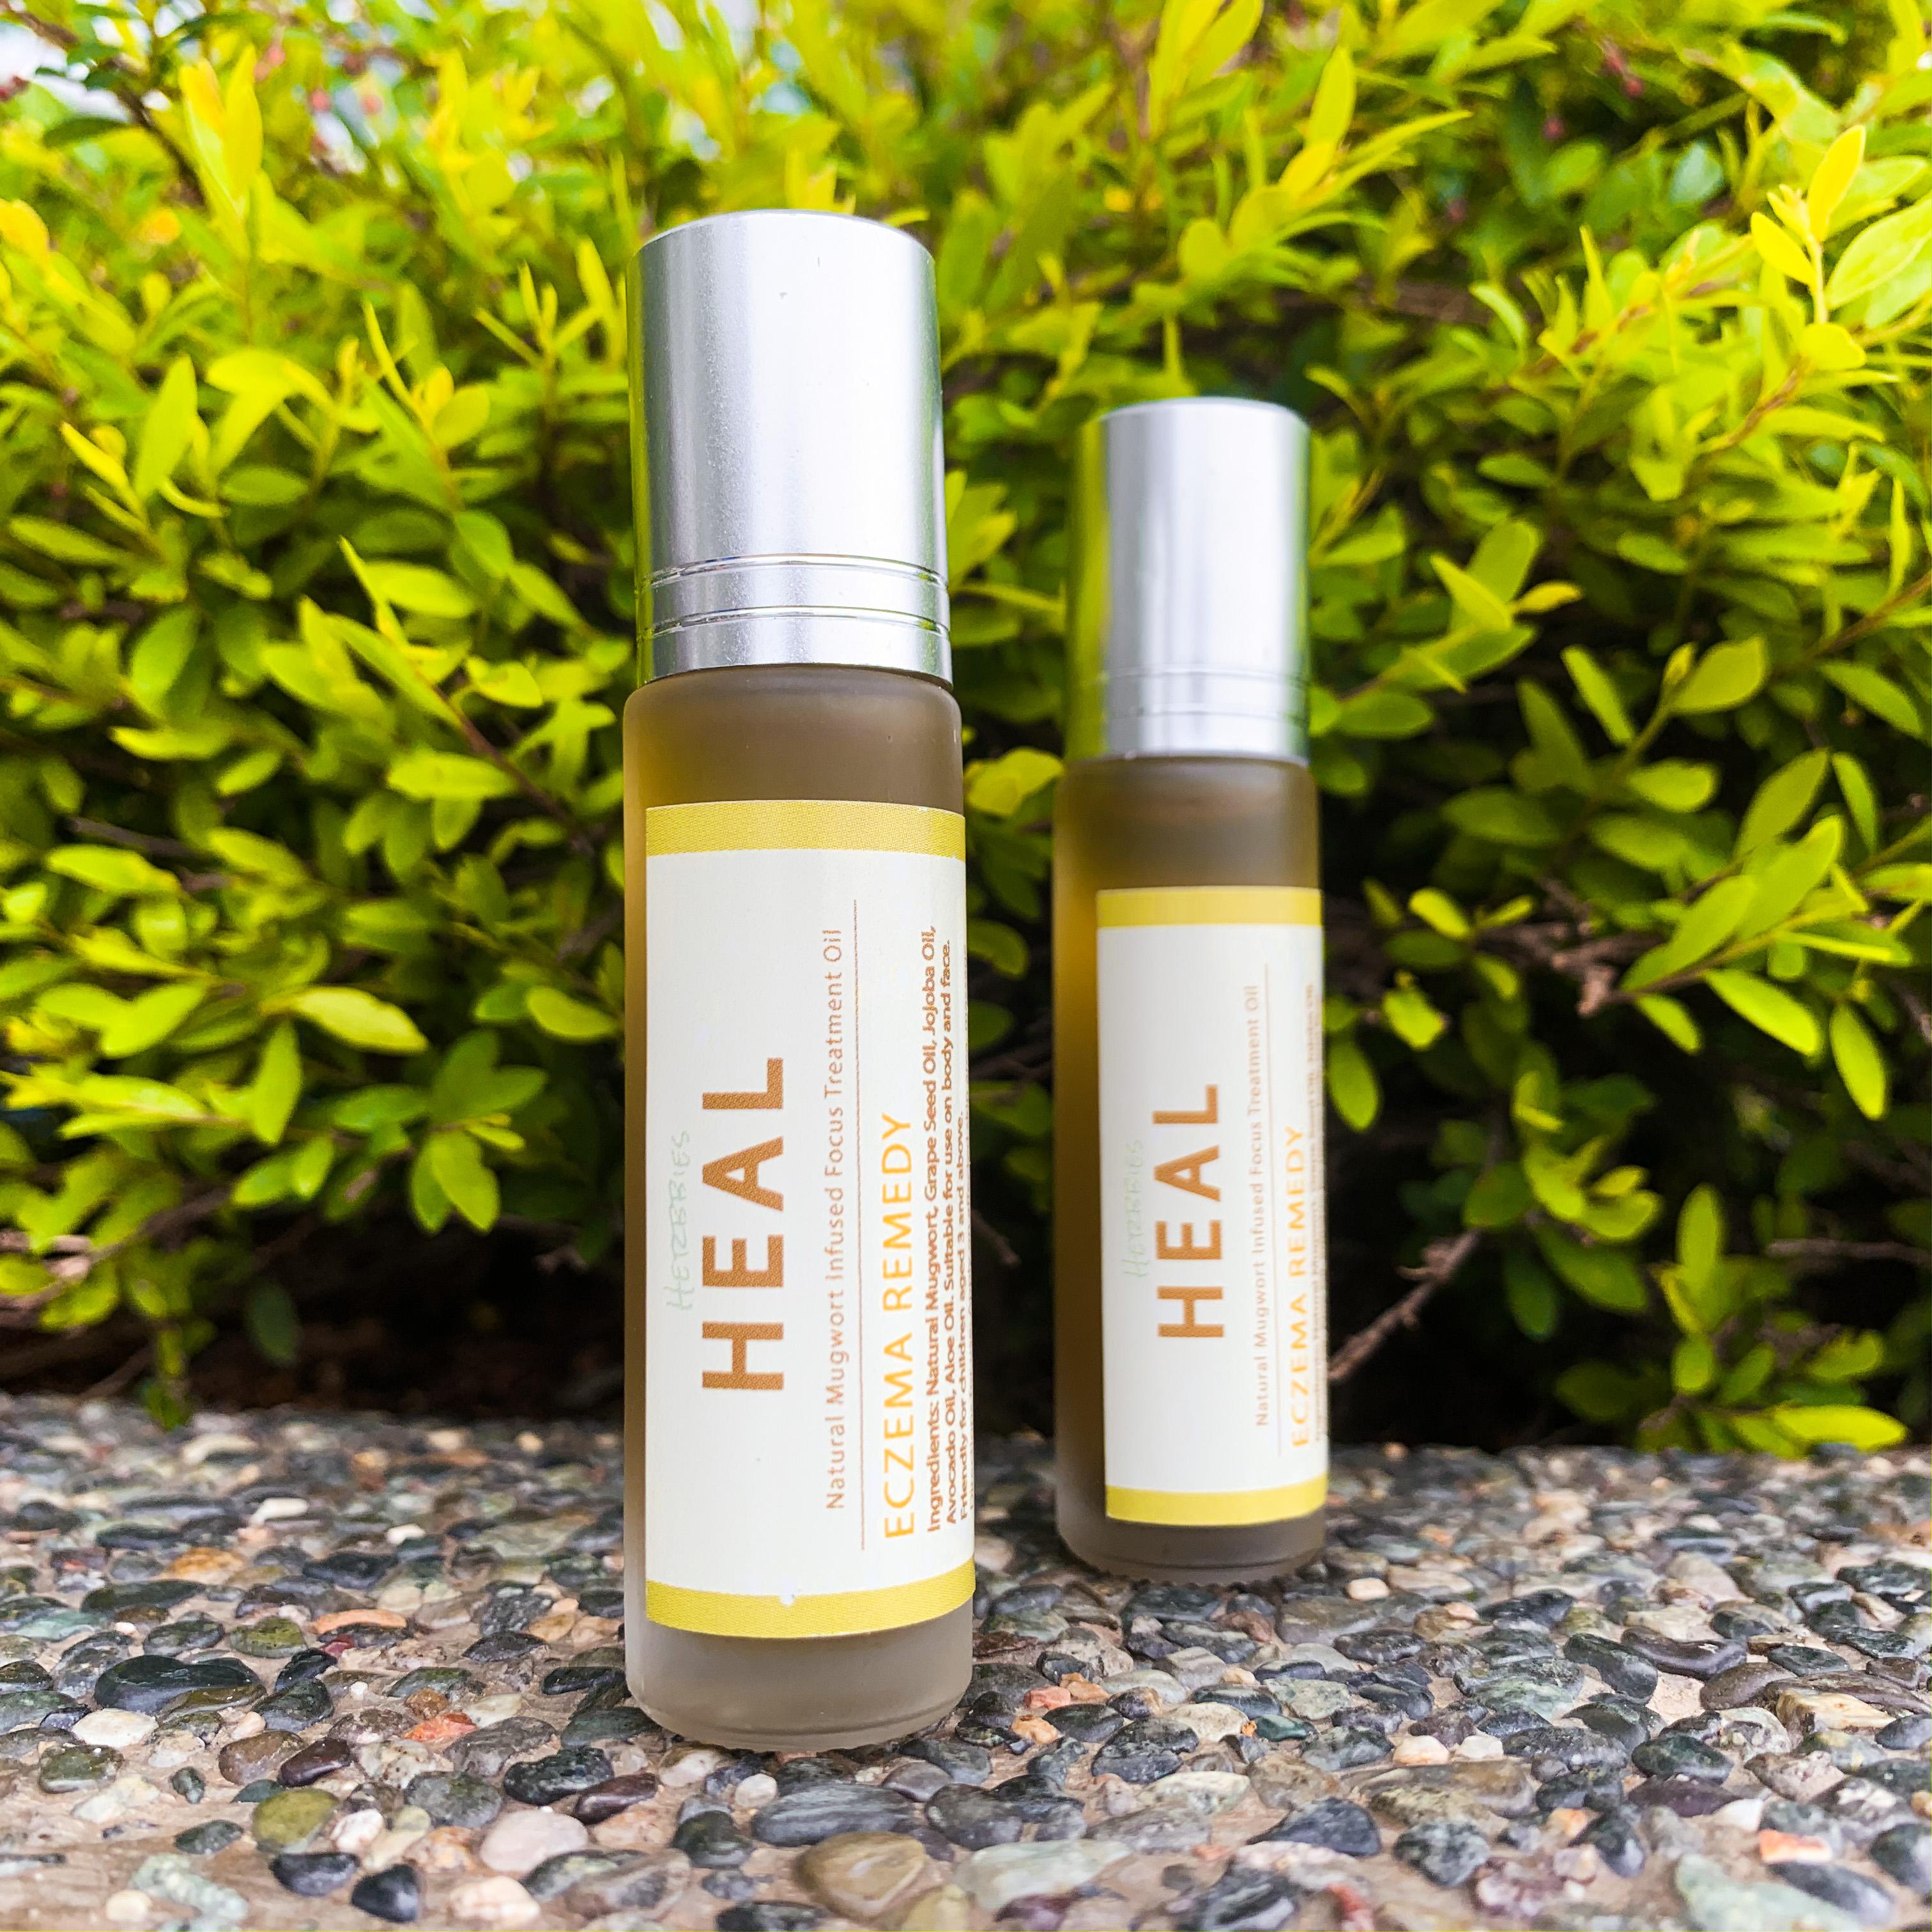 HEAL艾草-牛皮癬皮膚治療油